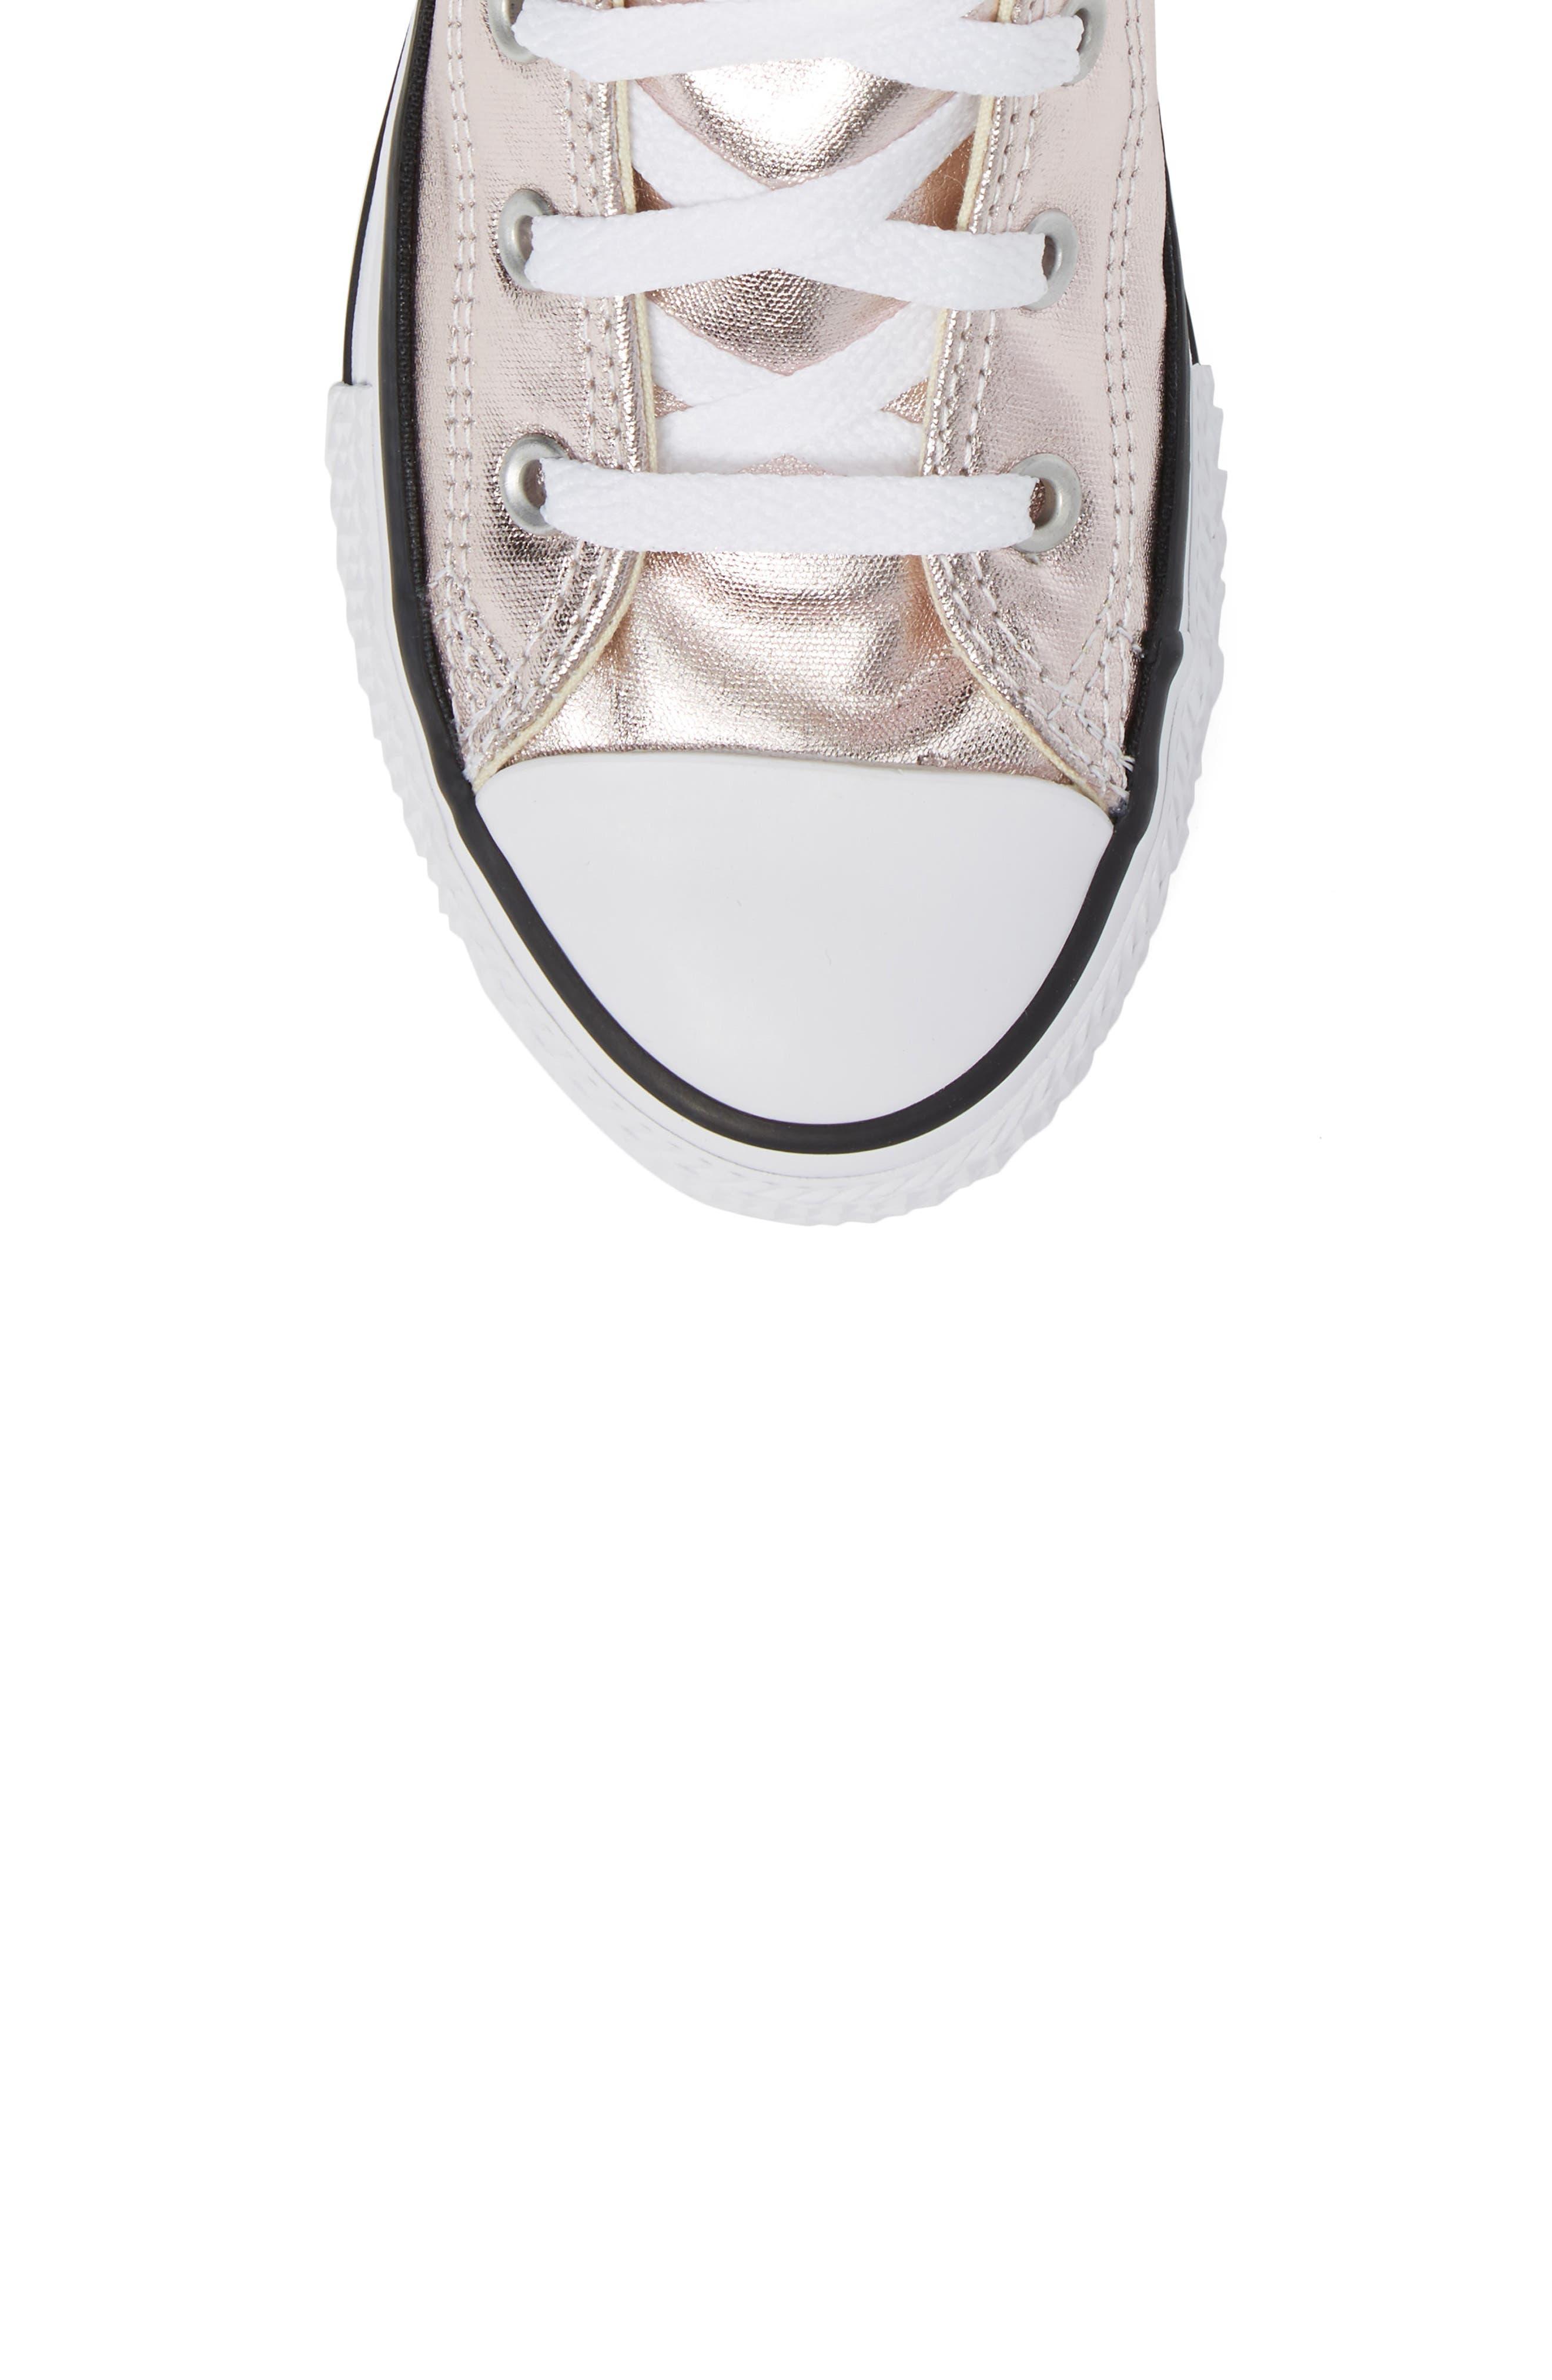 Chuck Taylor<sup>®</sup> All Star<sup>®</sup> Seasonal Metallic High Top Sneaker,                             Alternate thumbnail 5, color,                             221